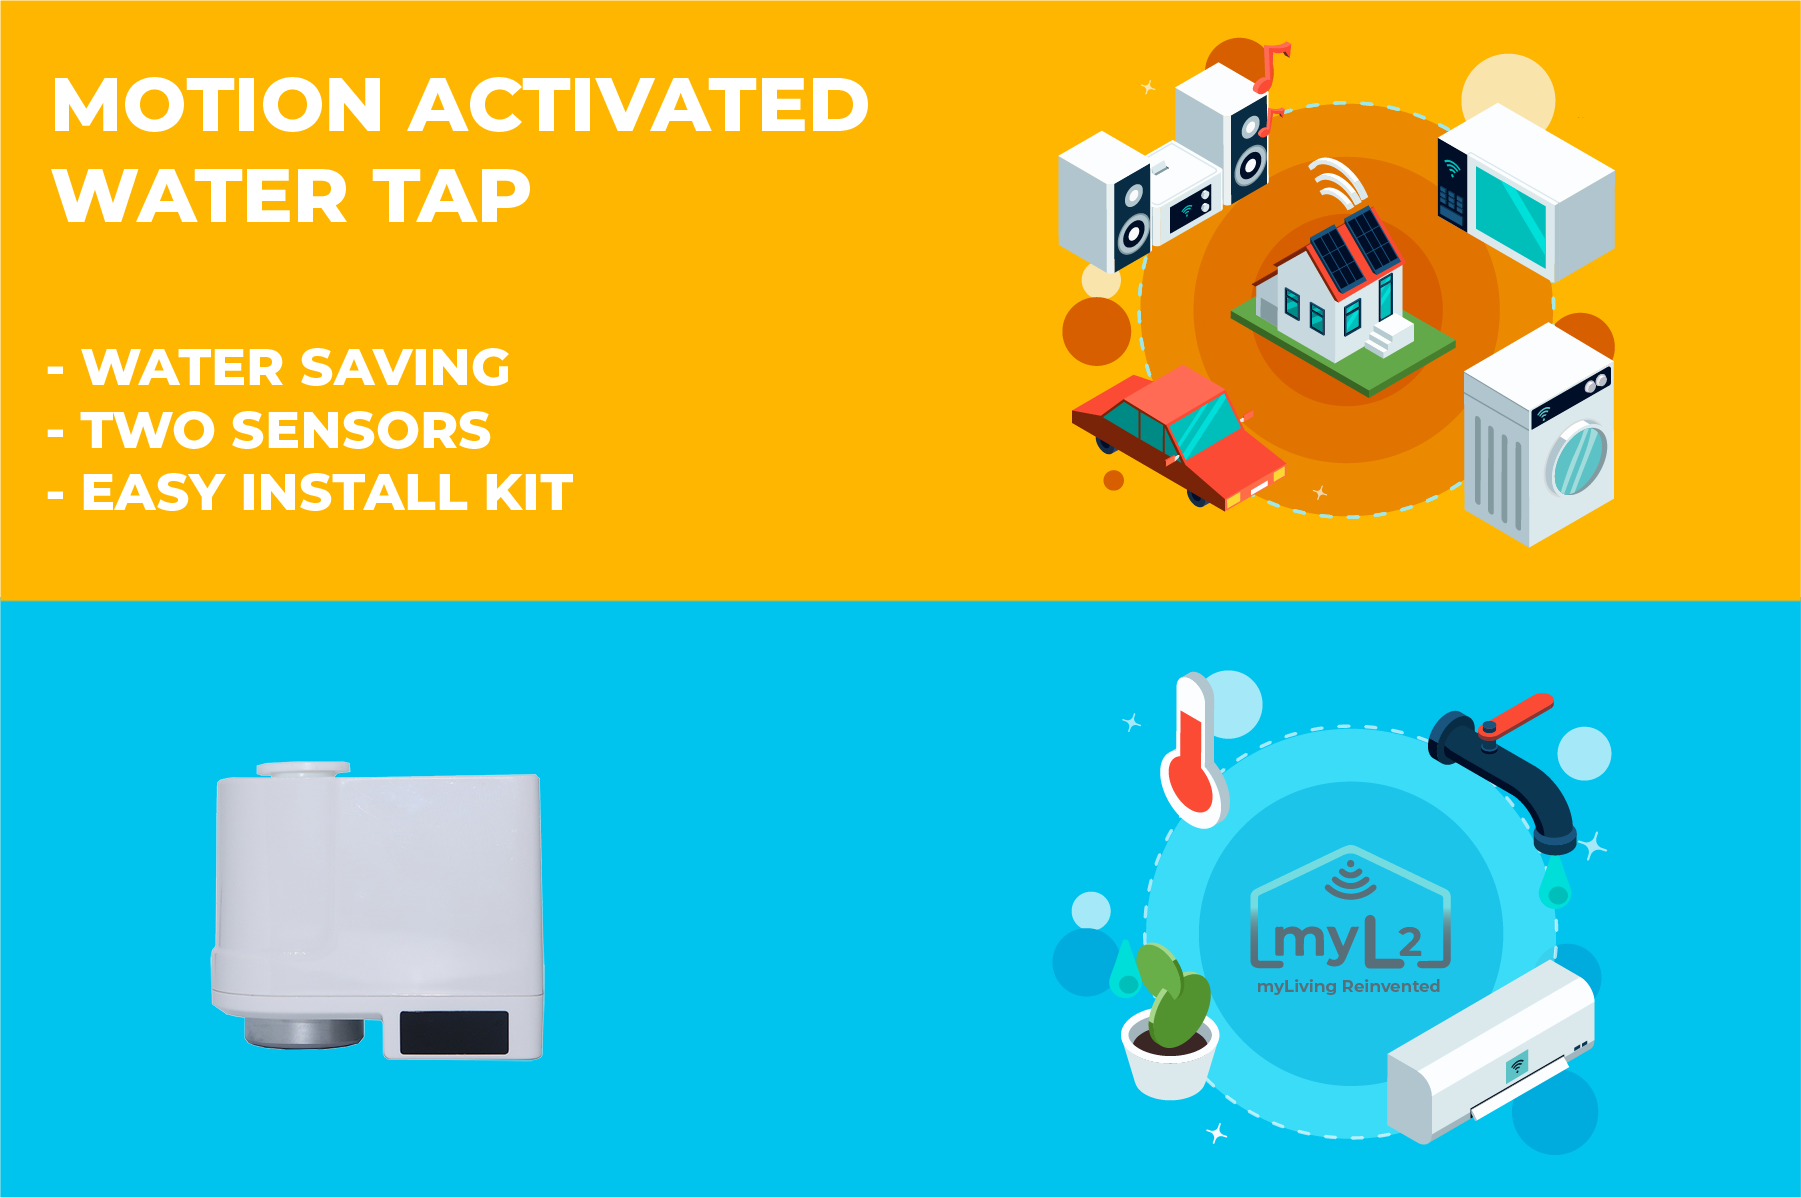 motion activated water saving tap xiaomi xiaoda